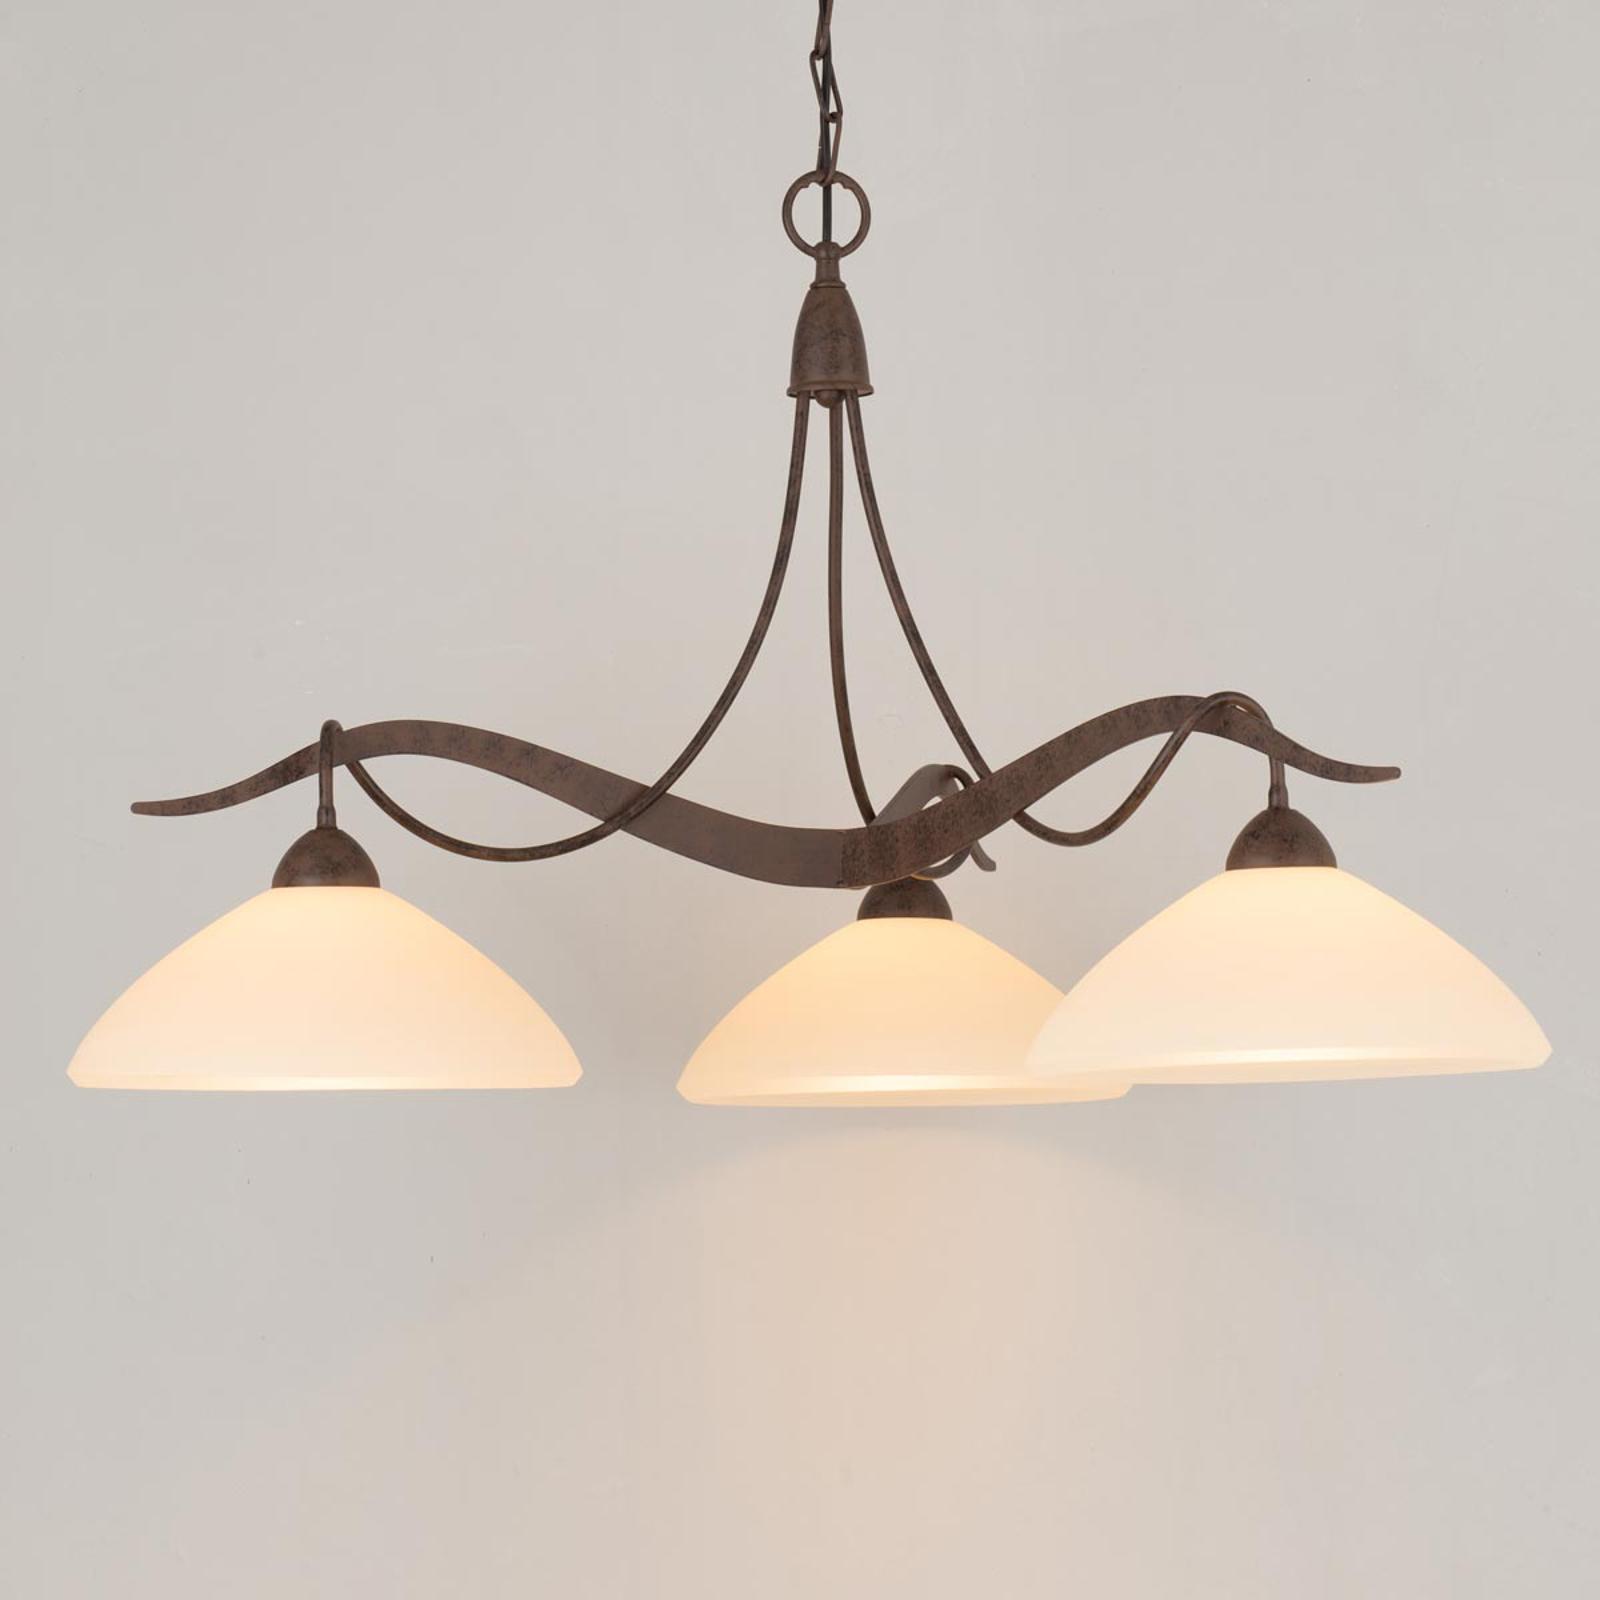 3-plameňová závesná lampa Samuele vidiecky štýl_6059300_1